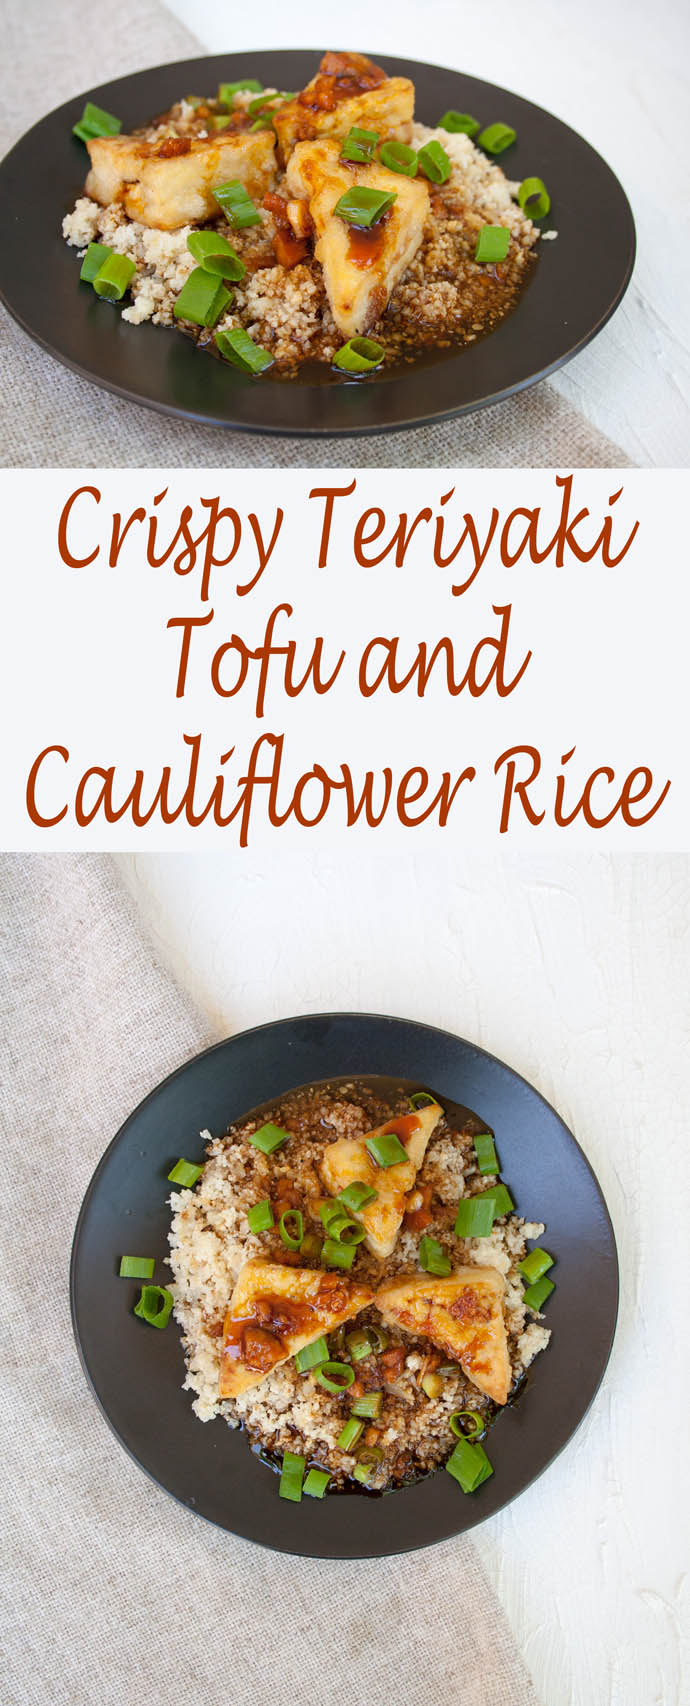 Crispy Teriyaki Tofu and Cauliflower Rice collage photo with text.